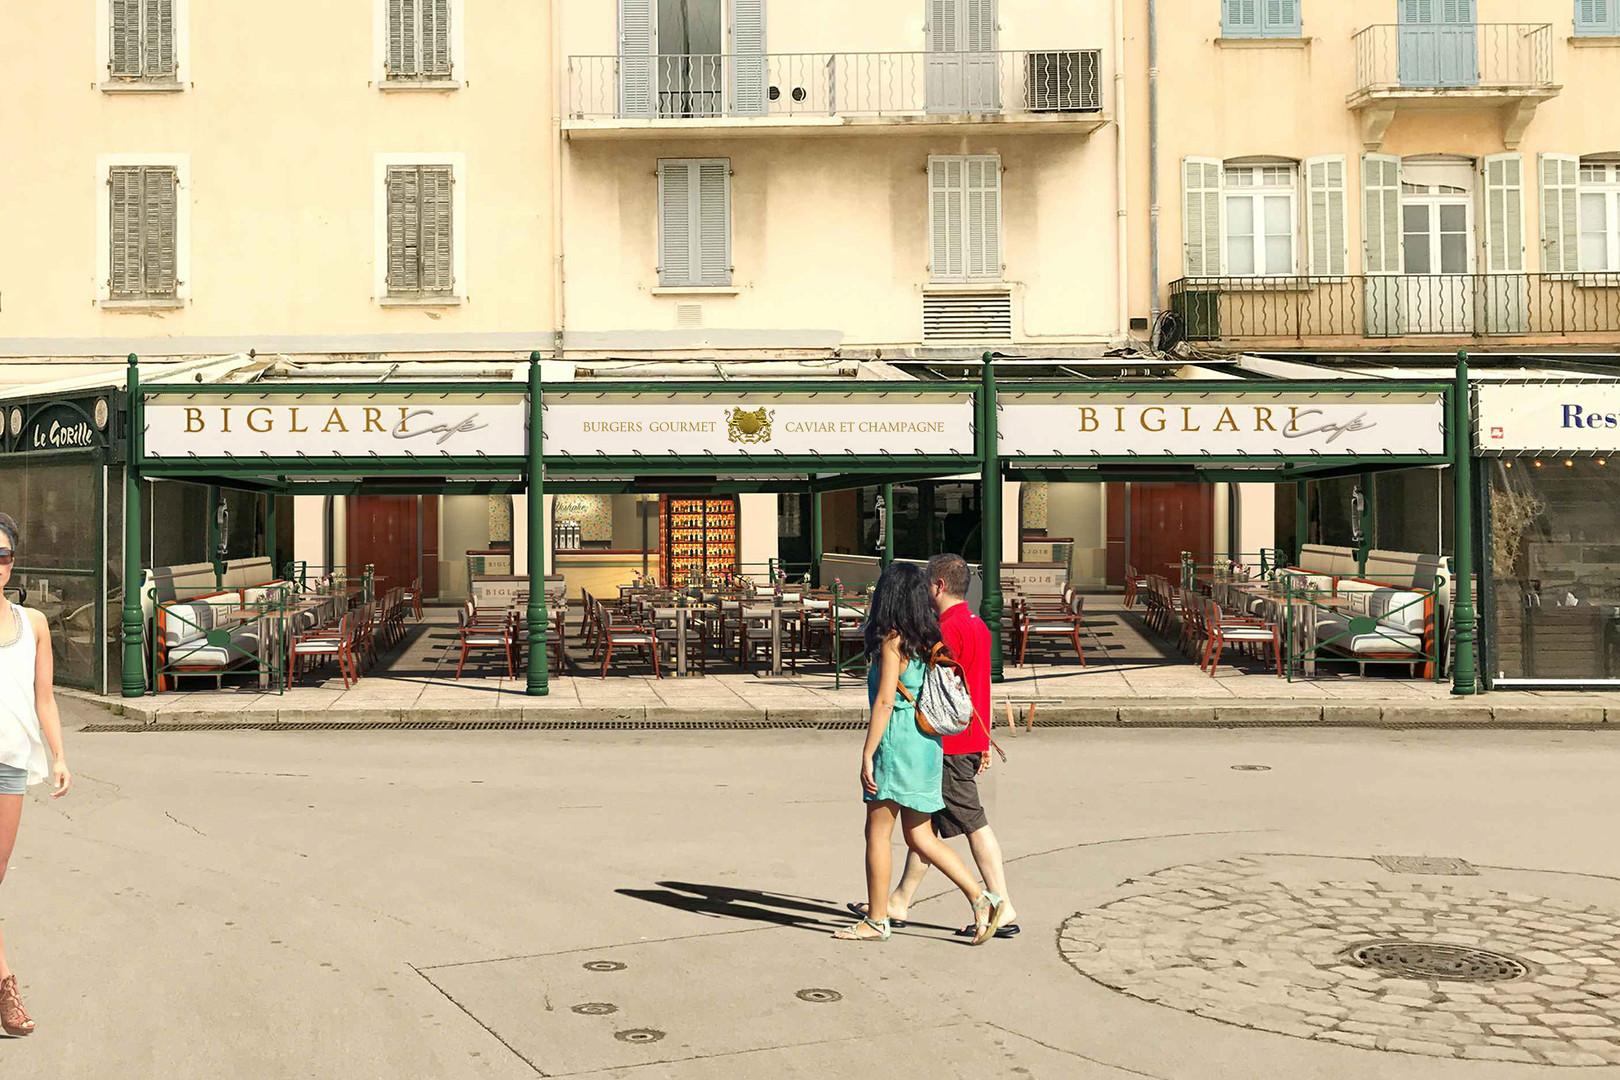 Biglari Cafe, St Tropez